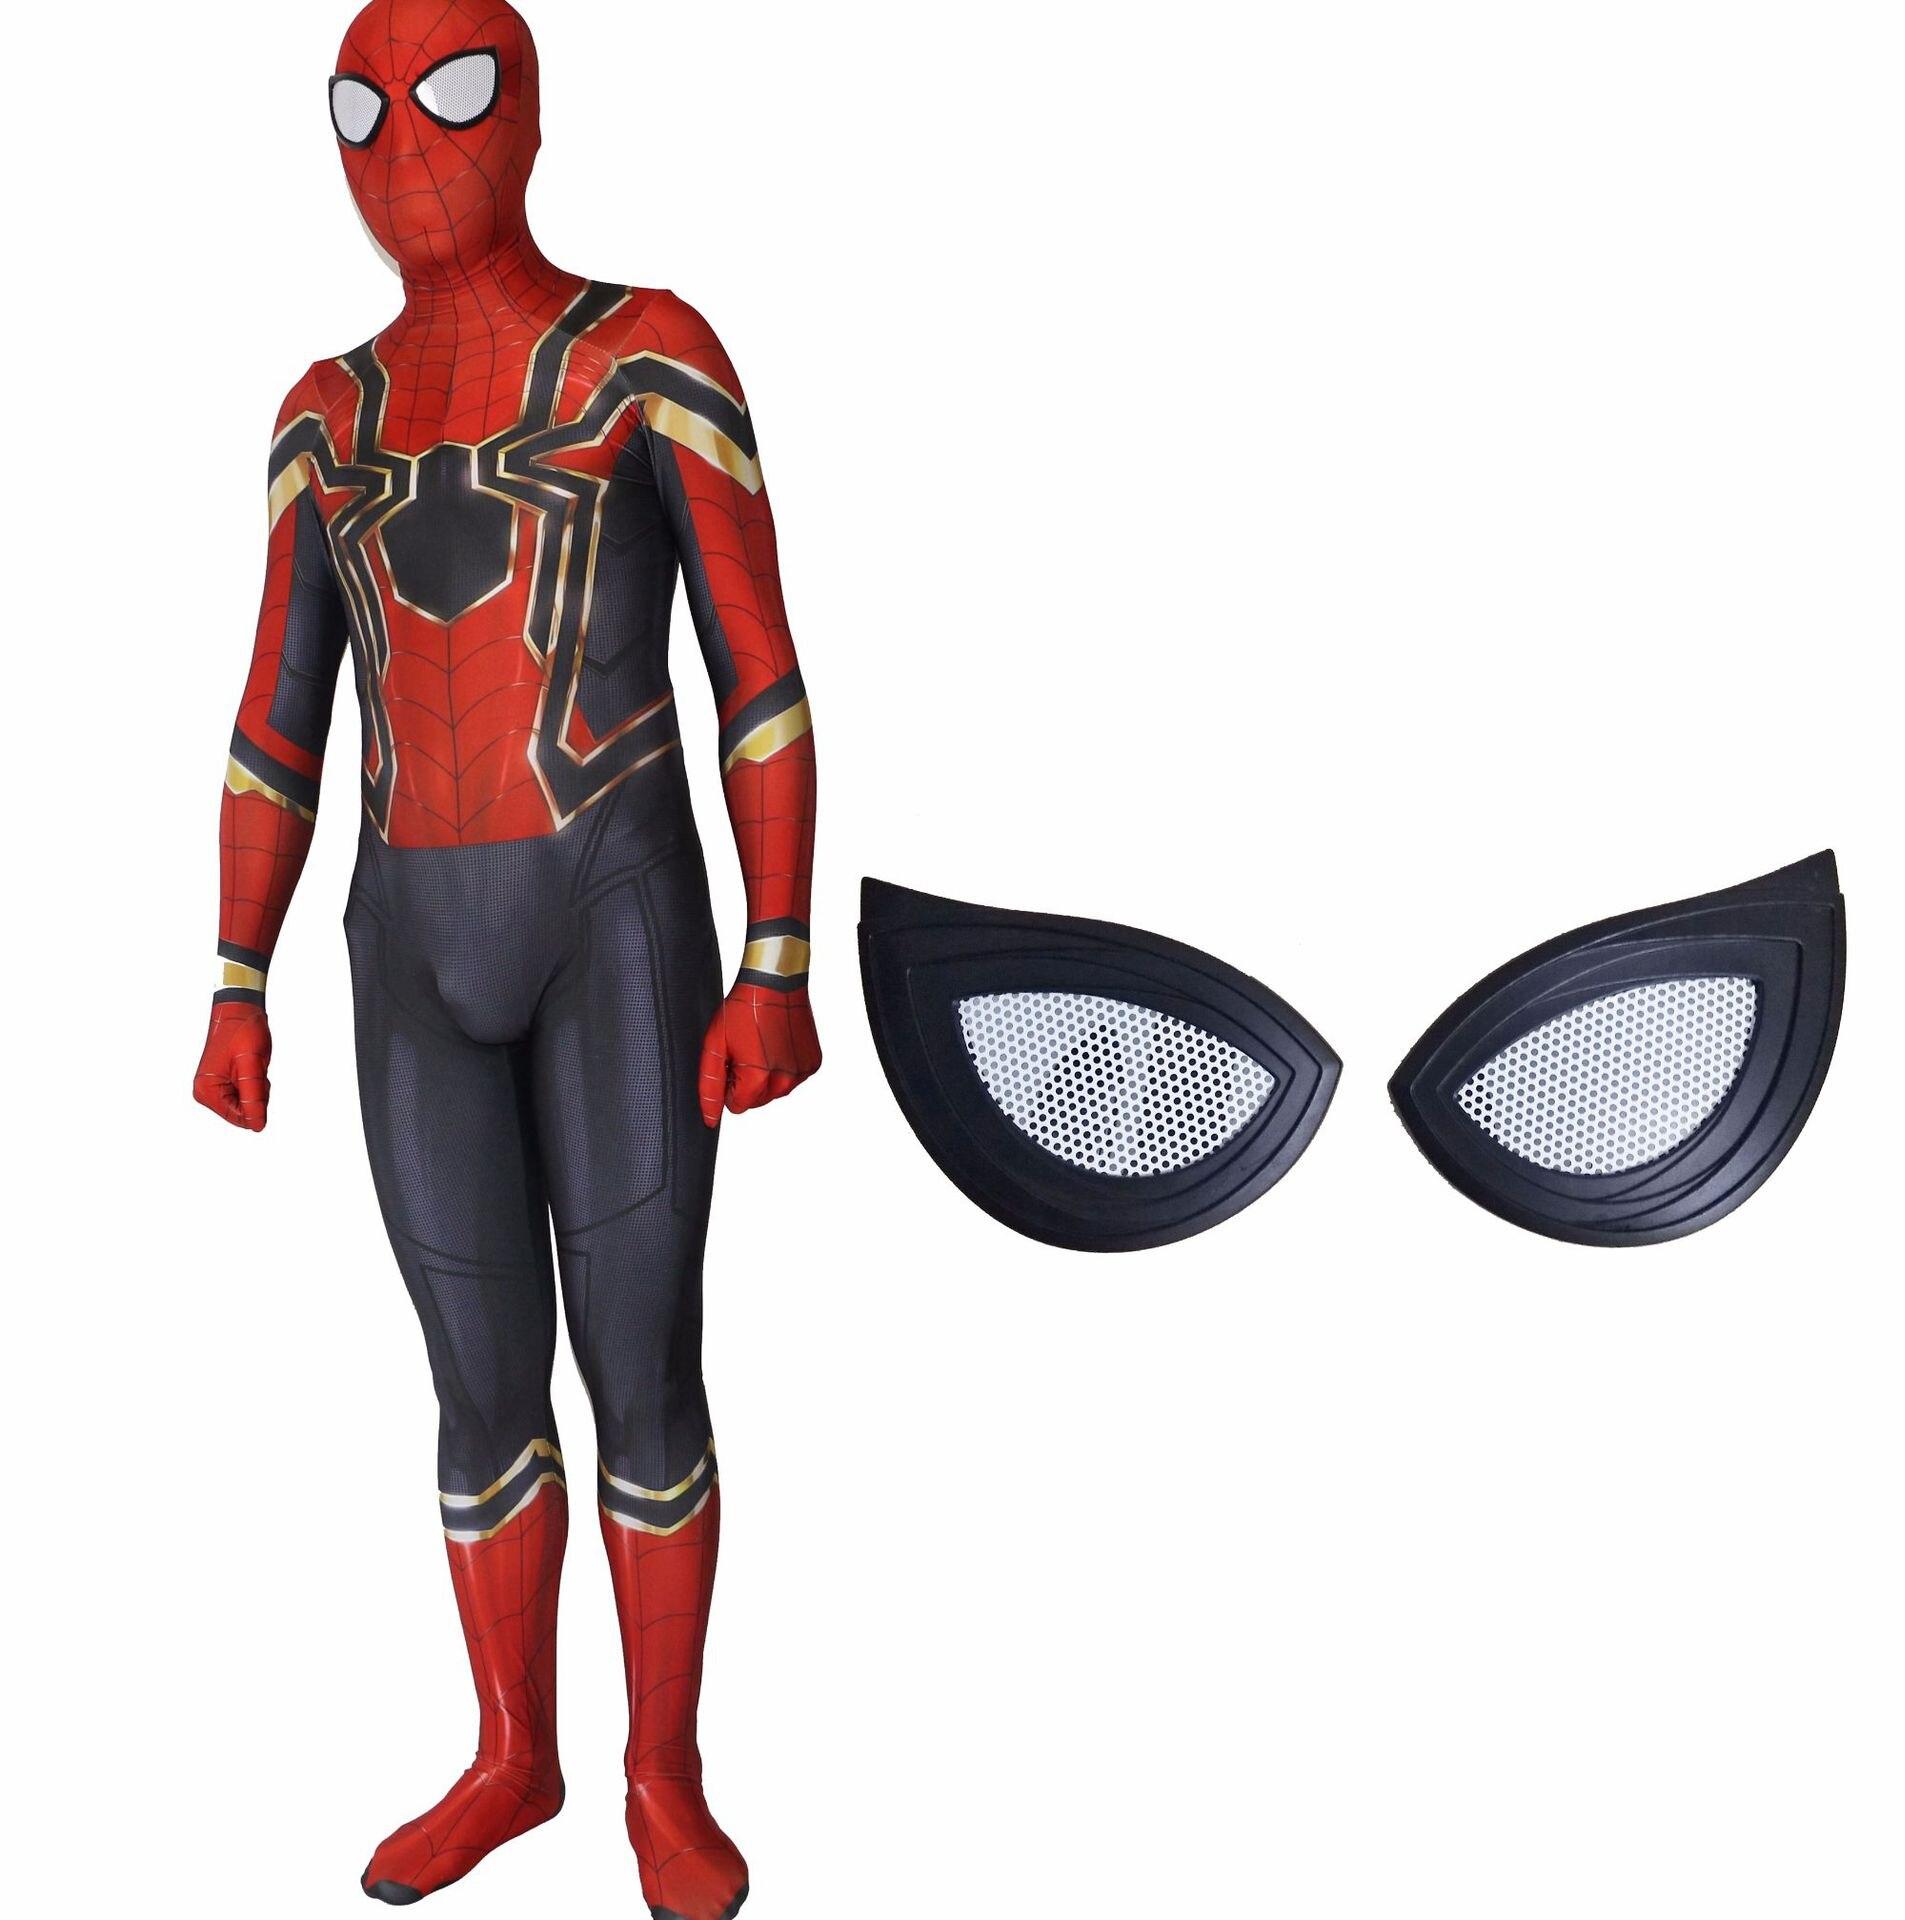 Adult Men Deluxe Spiderman Costume Homecoming Cosplay Amazing Superhero Fantasy Movie Fancy Dress